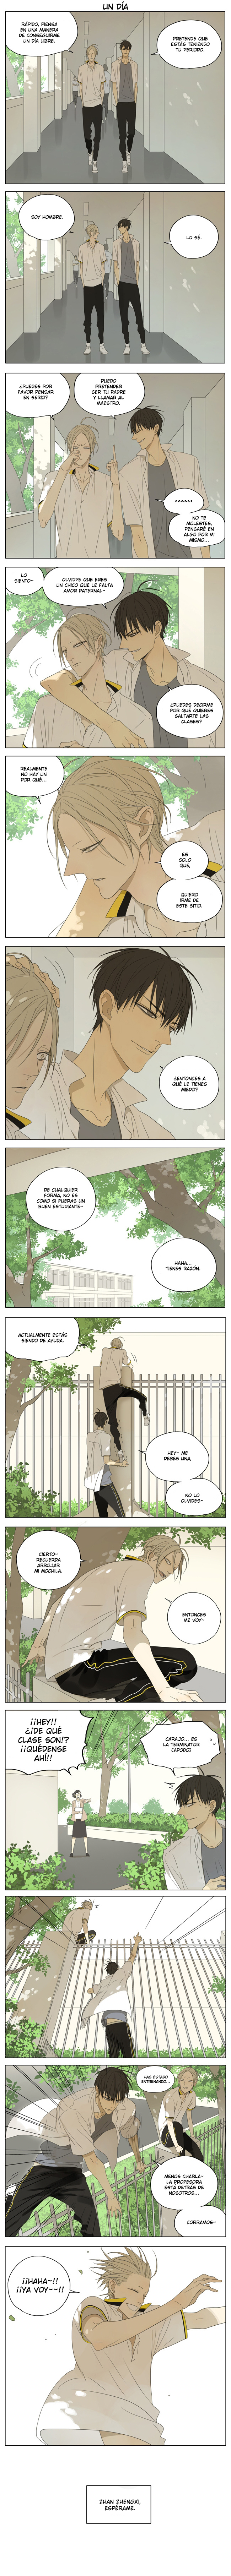 http://c5.ninemanga.com/es_manga/7/15943/430532/359513286e98511b129e2c6b20ce8580.jpg Page 8